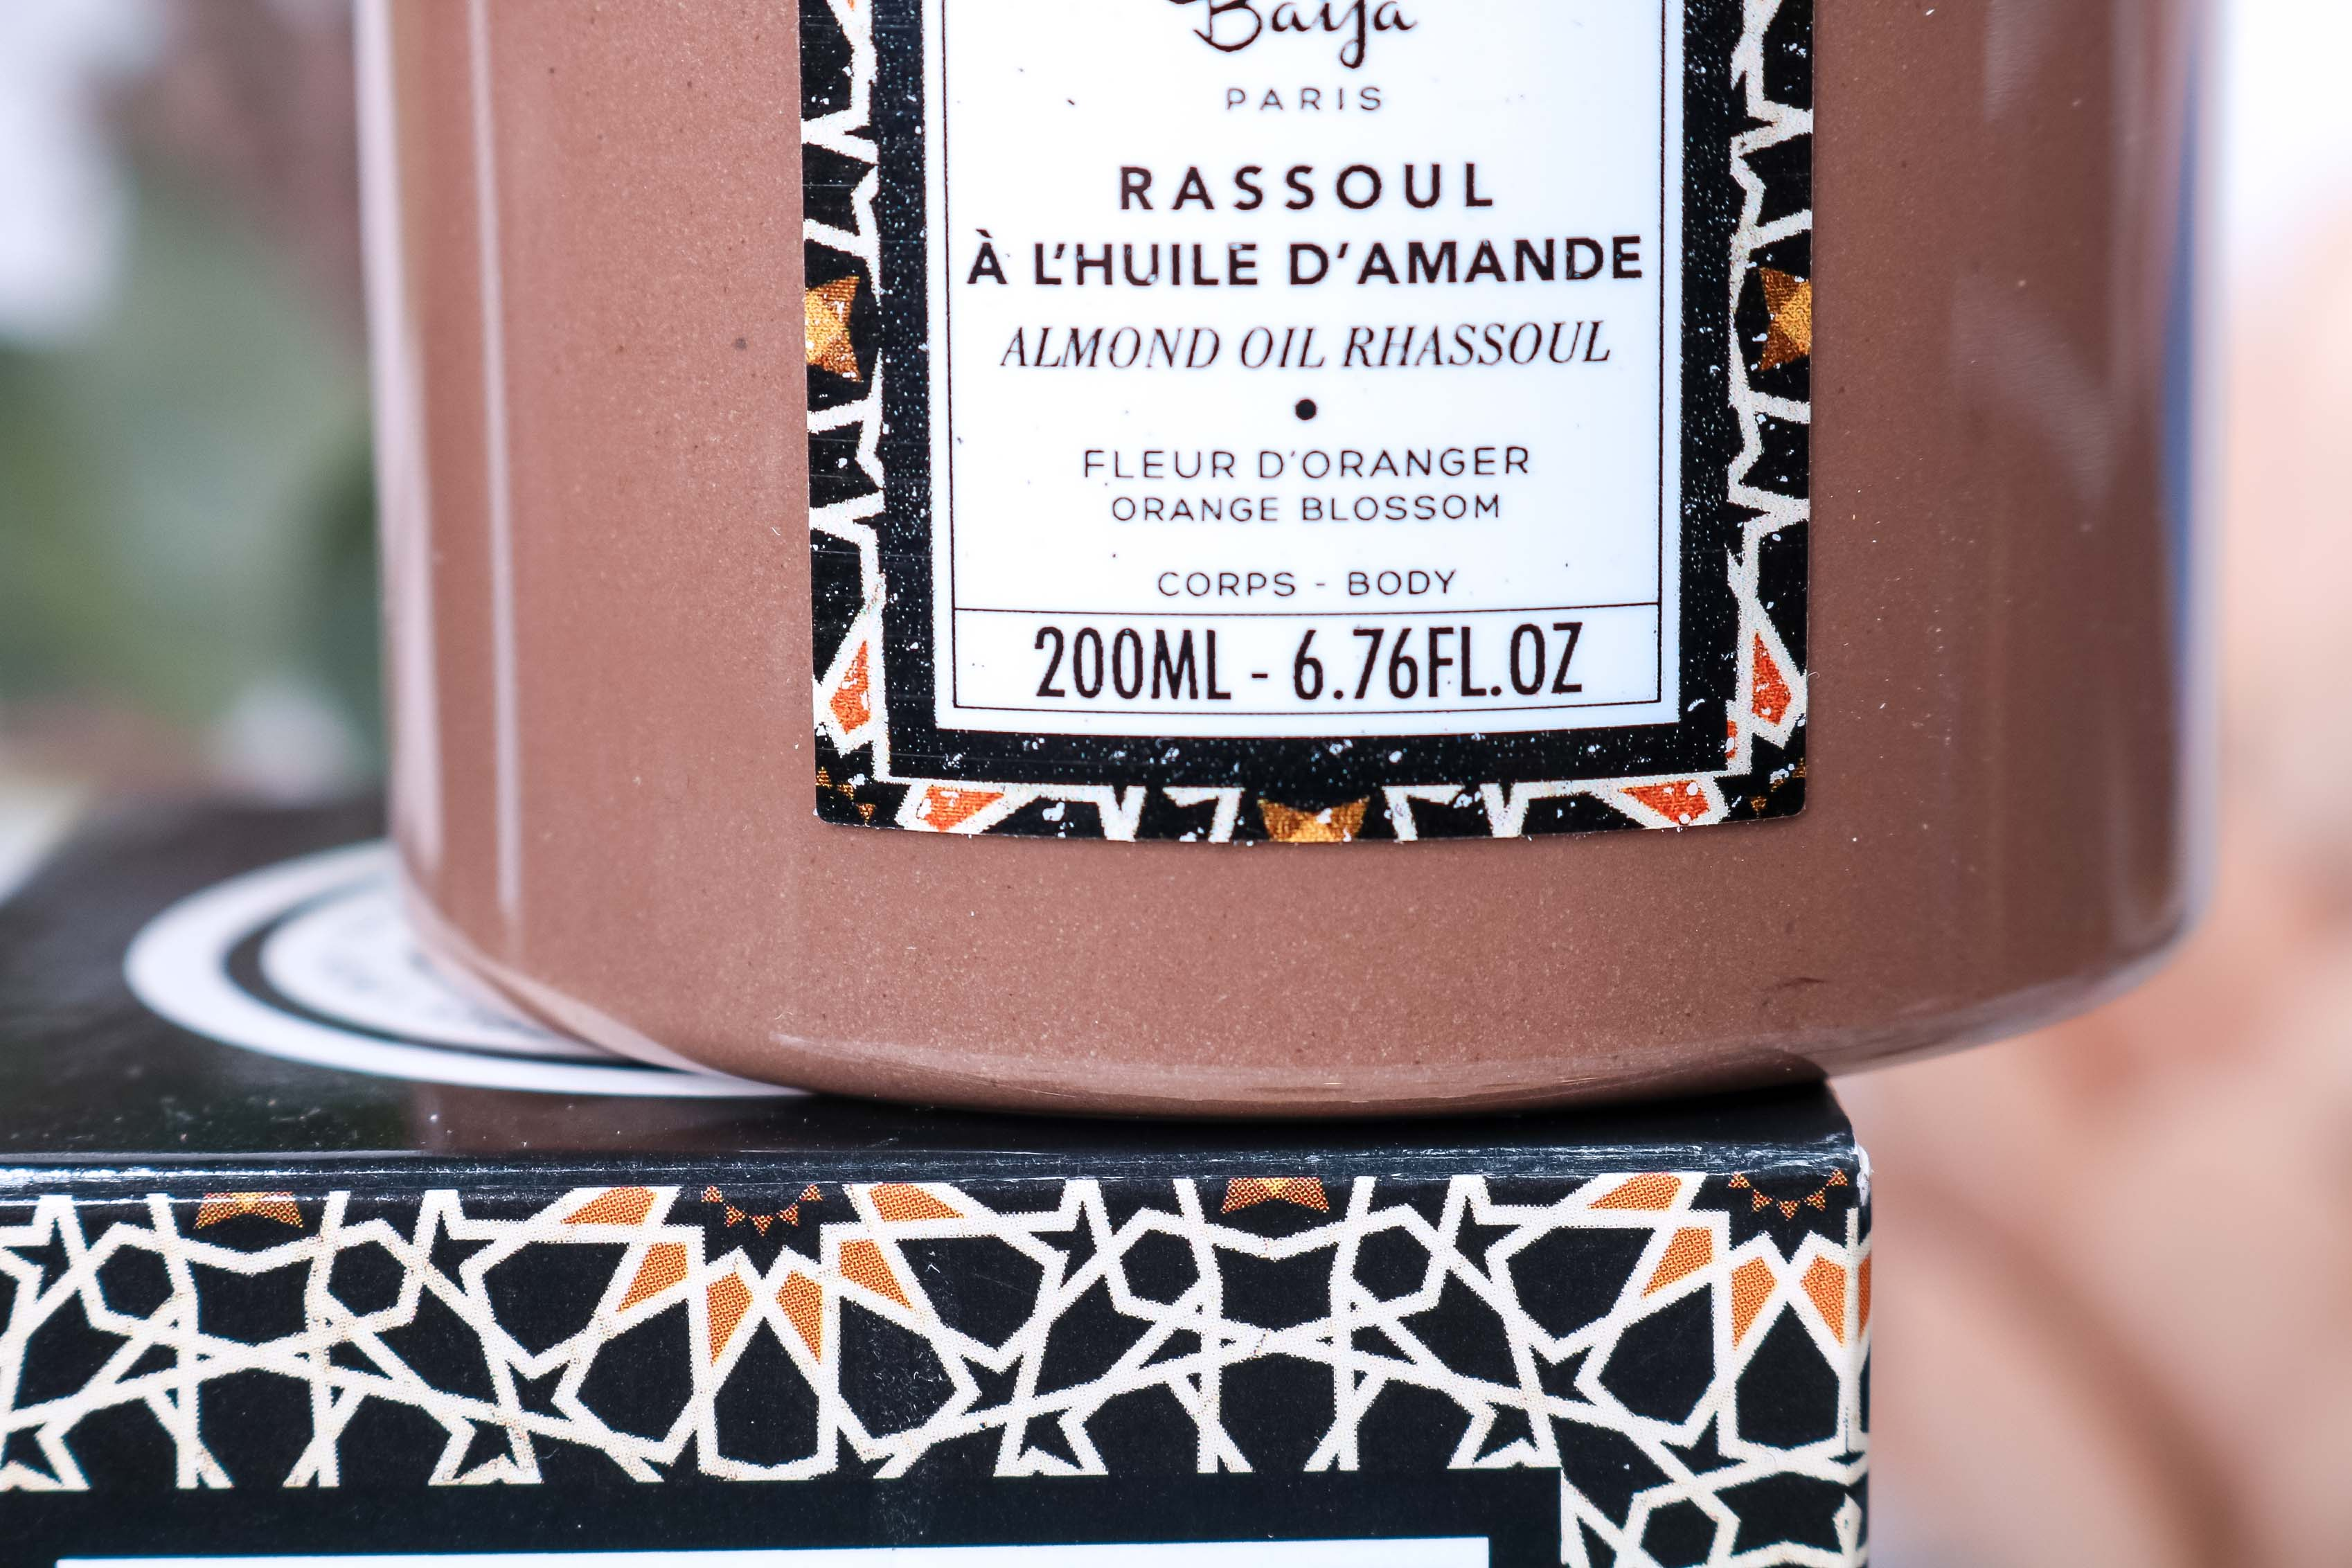 revue-collection-rituel-hammam-baija-paris-corps-savon-gommage-soin-eucalyptus-makeupbyazadig-avis-prix-sephora-fleur-oranger